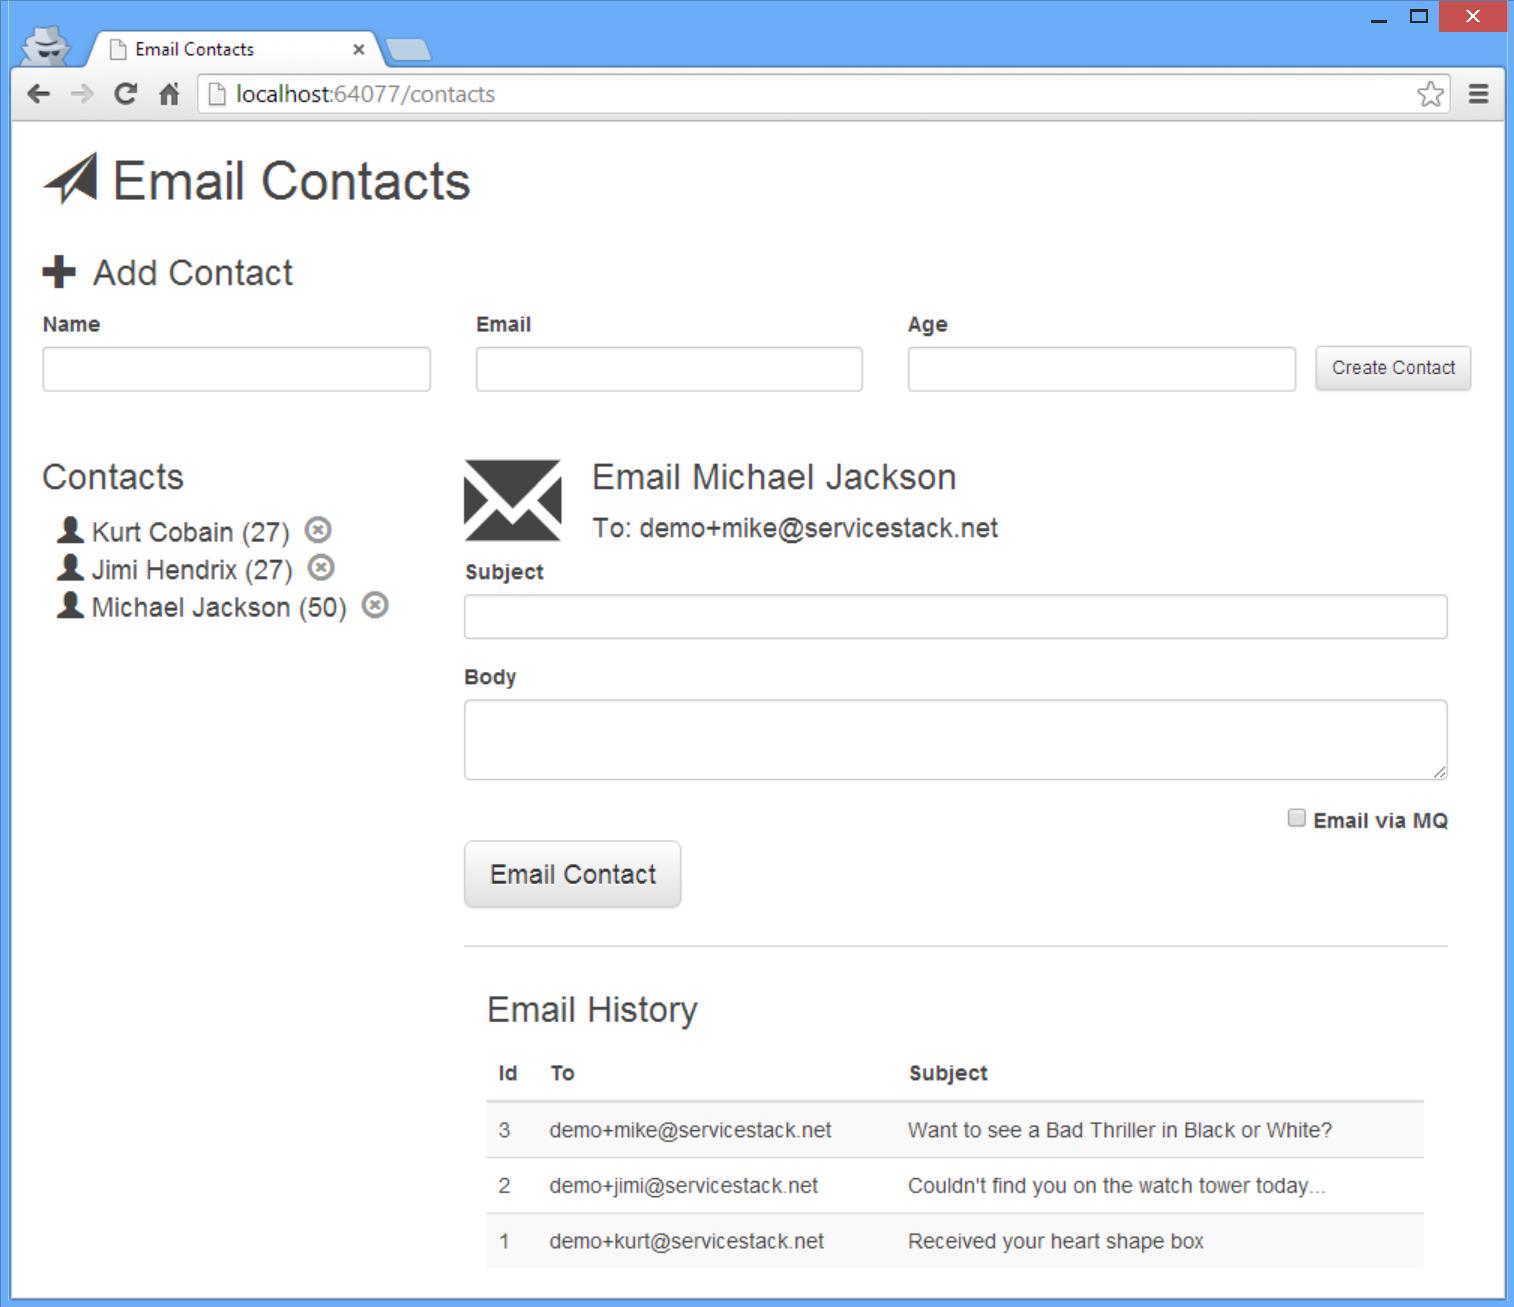 EmailContacts Screenshot